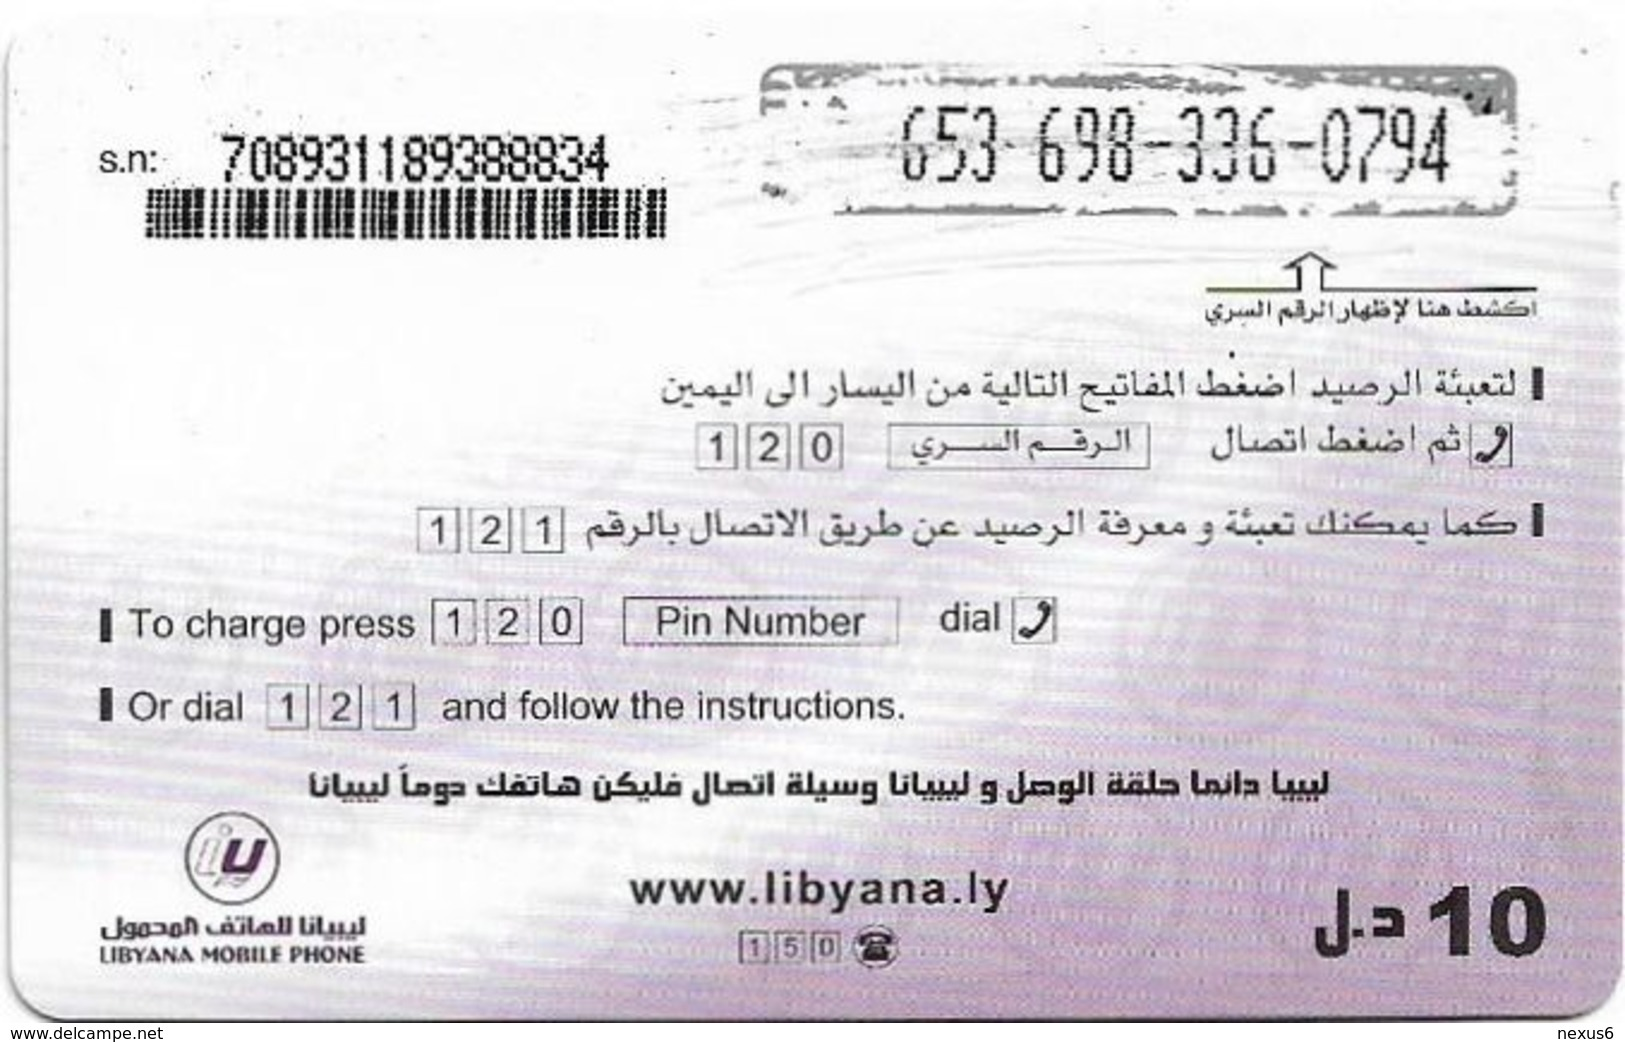 Libya - Libyana - Landscape, 10LD Prepaid Card, Used - Libya